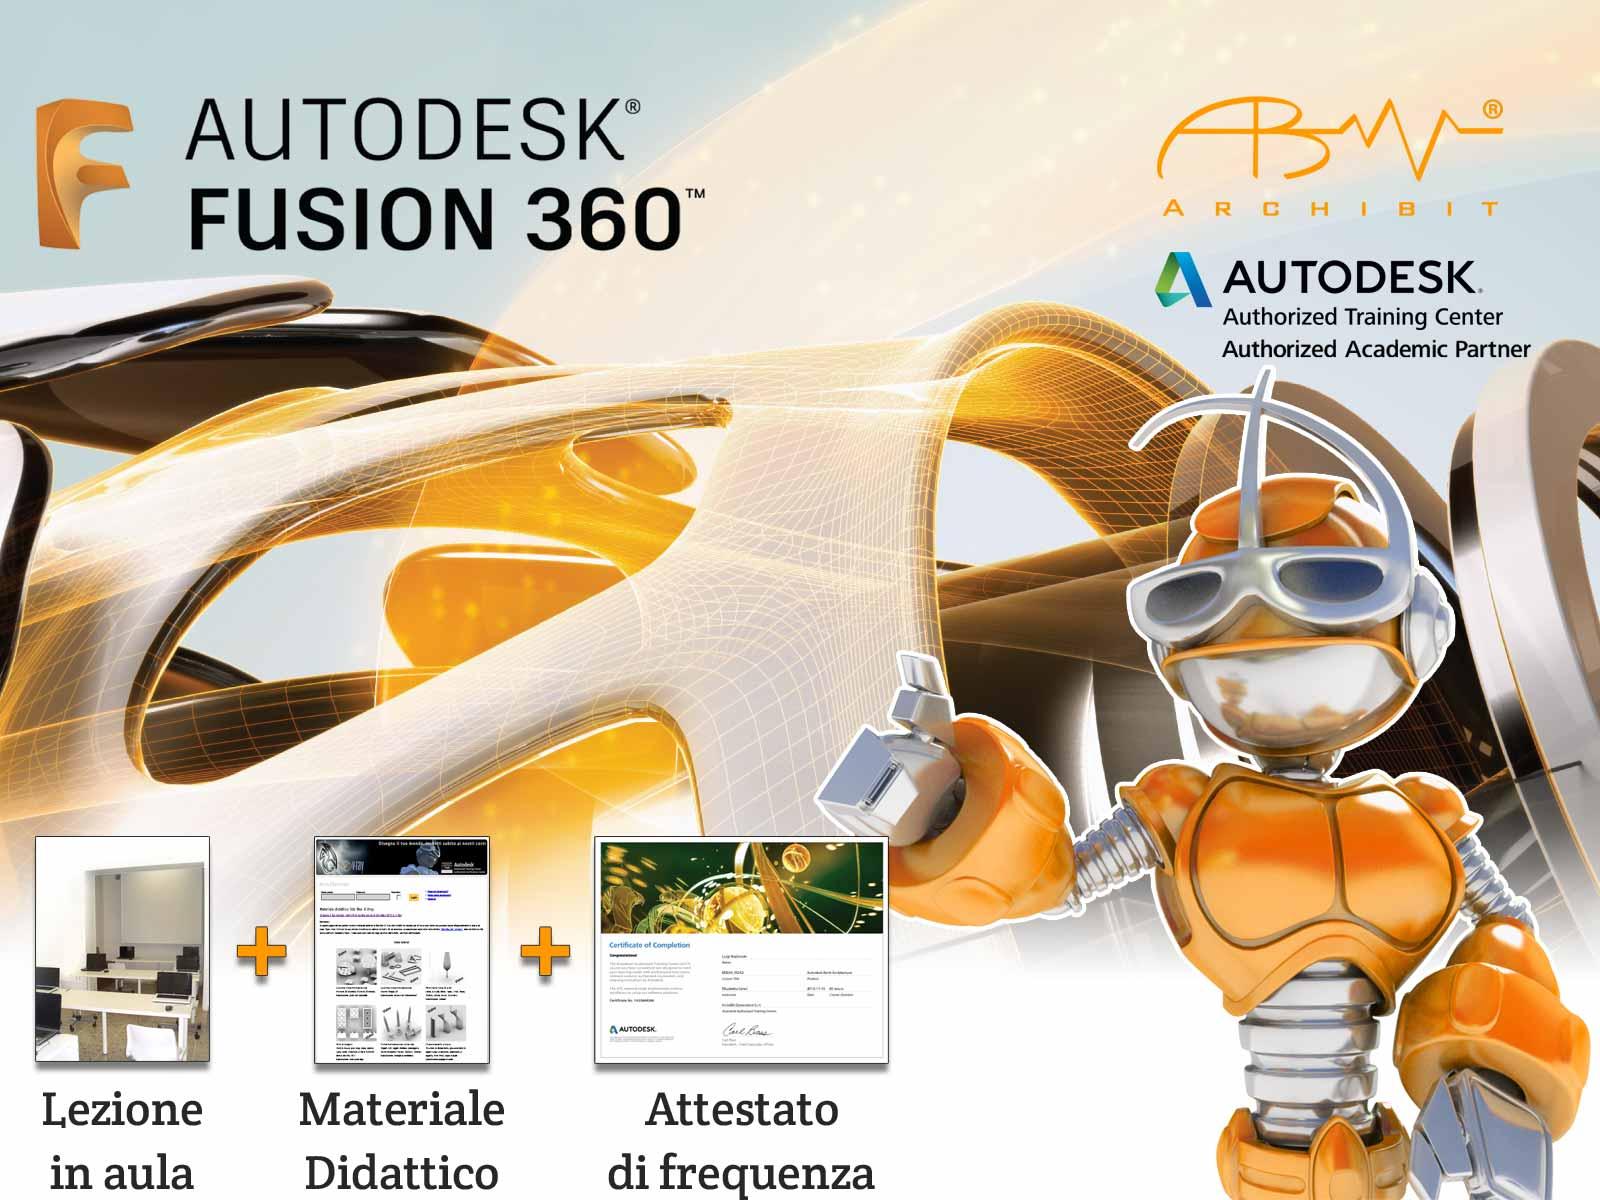 workshop fusion 360 gratis corso autodesk fusion360 archibit centro corsi autodesk roma